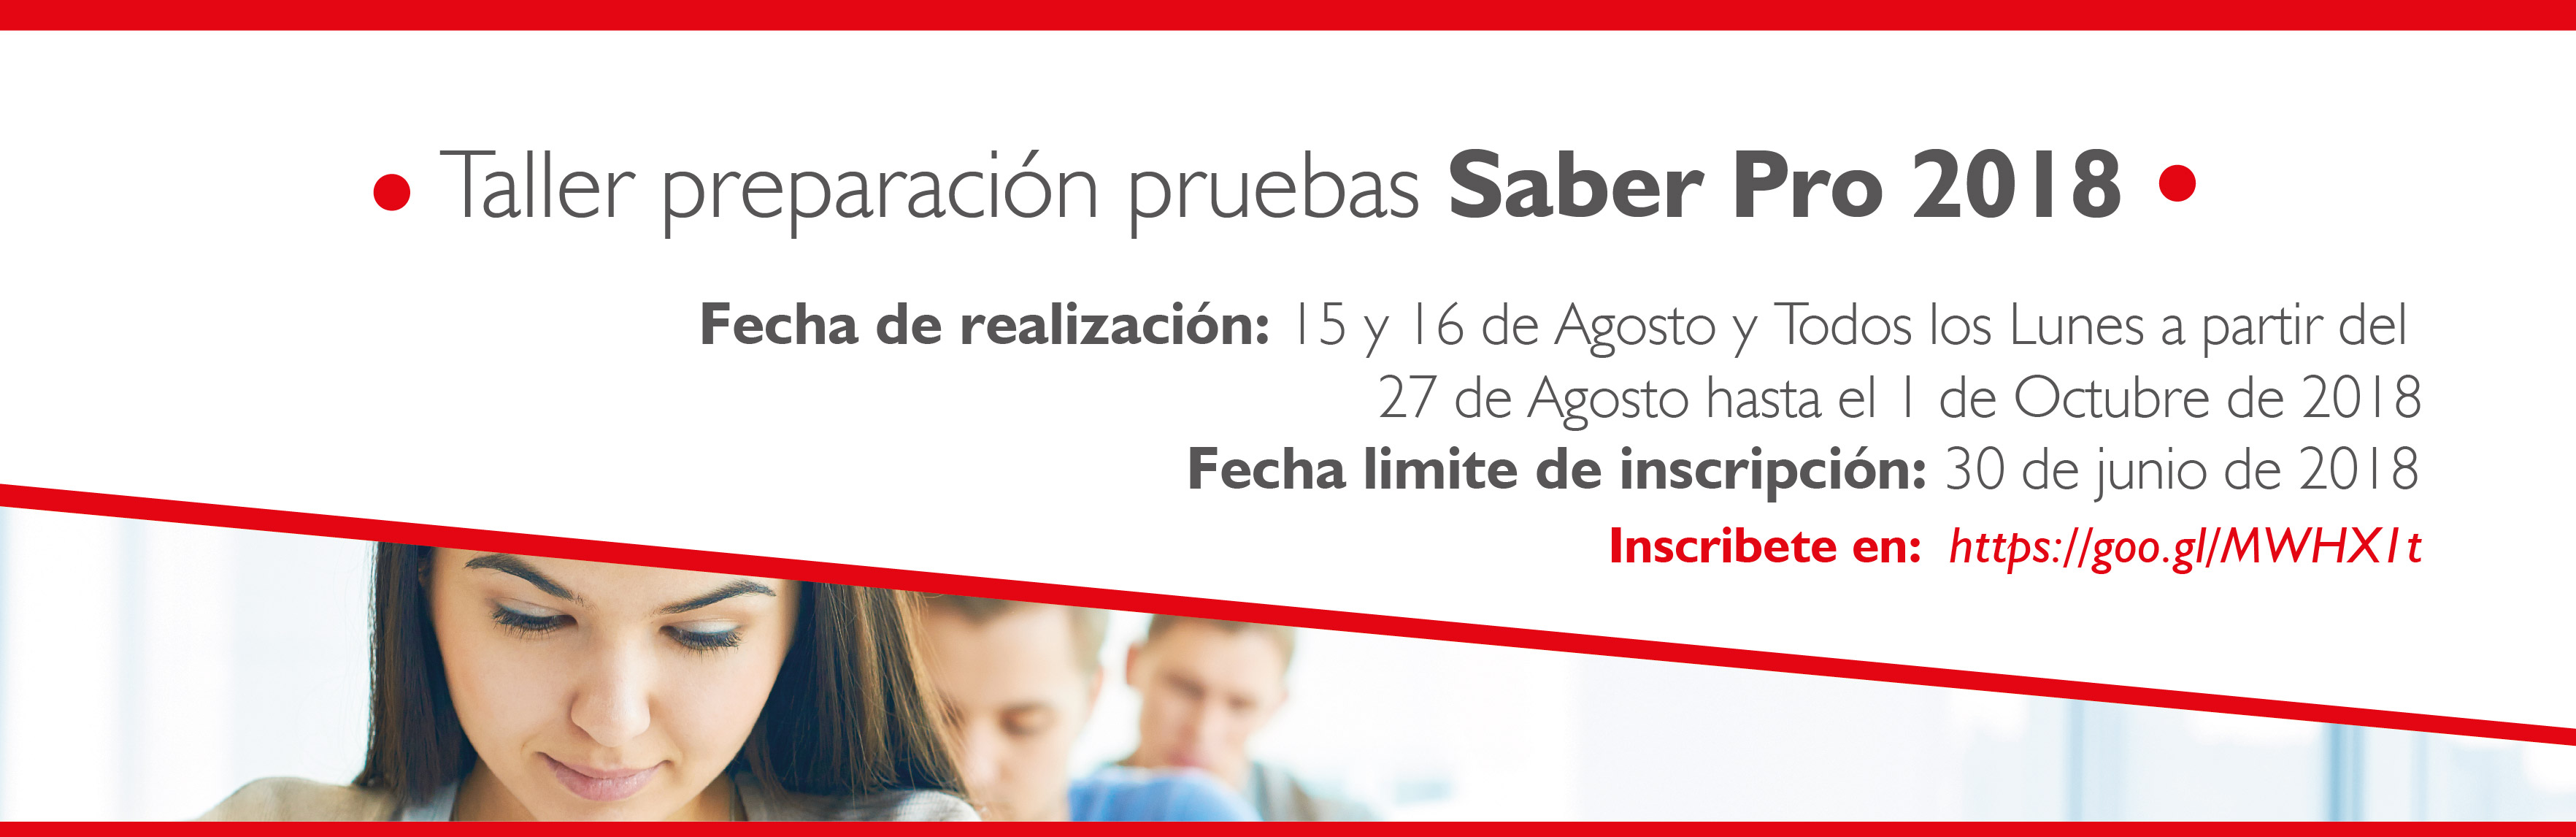 http://fayol.univalle.edu.co/bannerhtml5/2018-08-13-Taller-preparacion-saber-pro-04.jpg